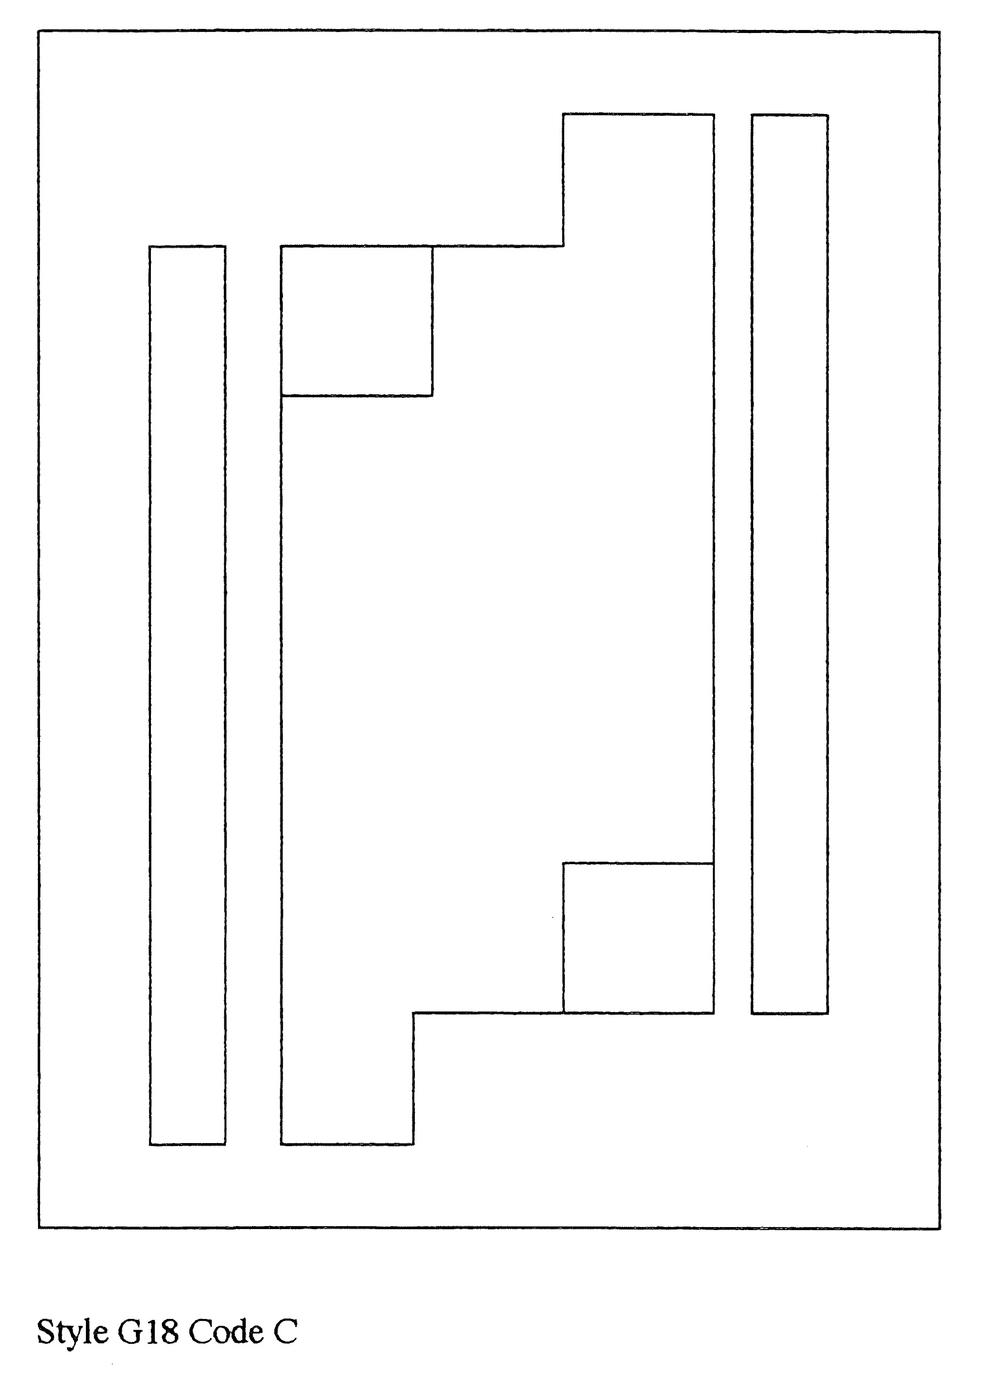 Page 17 copy 3.jpg